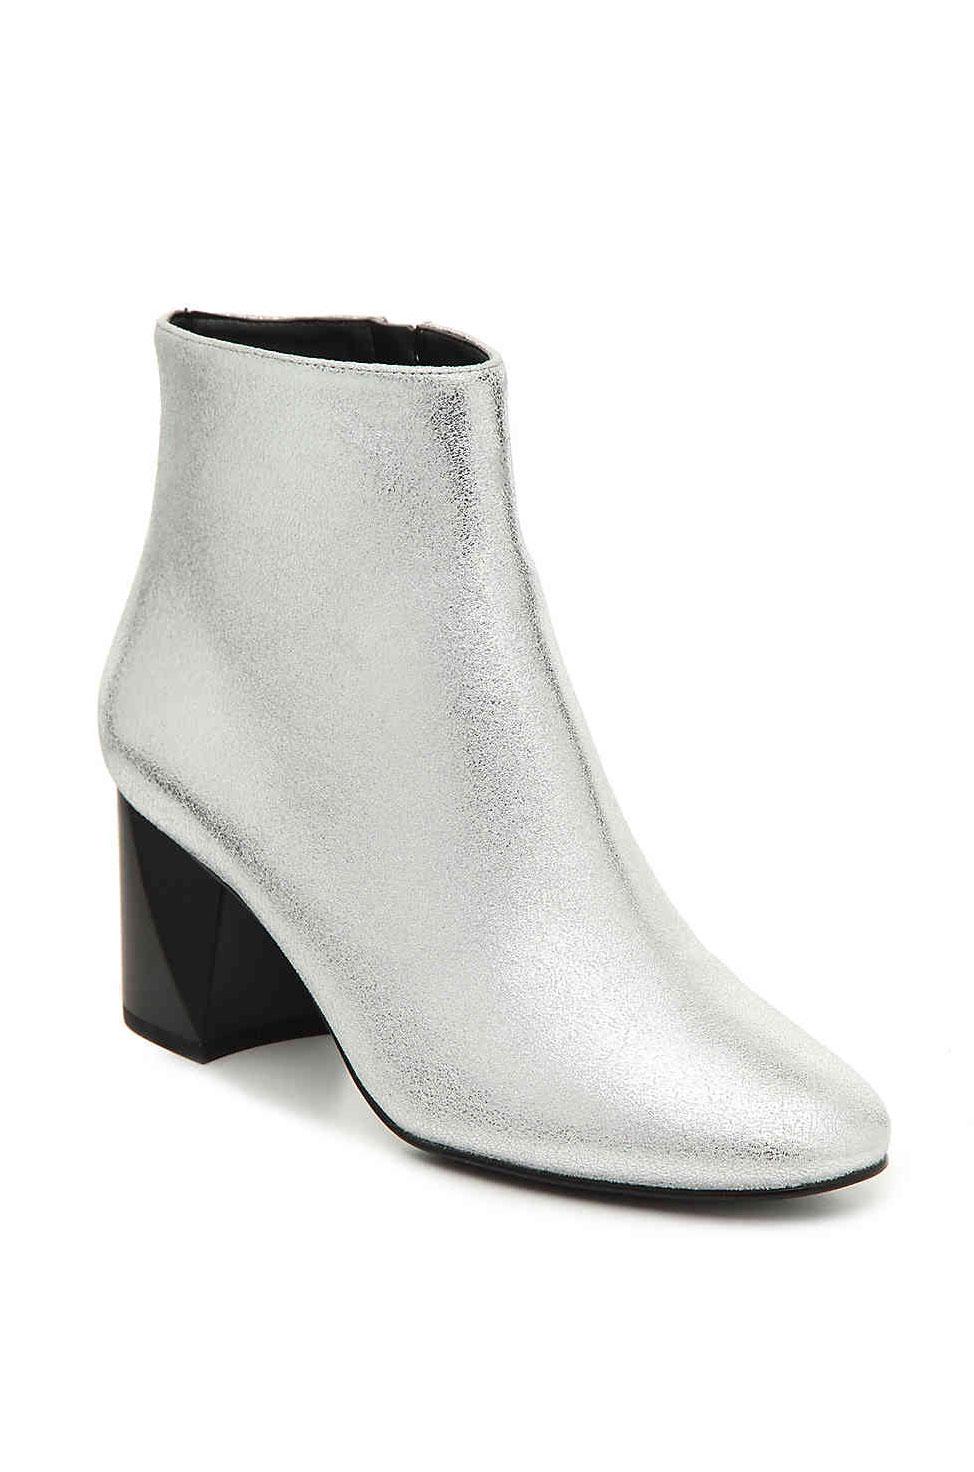 Kendall + Kylie Metallic Boots     $69.99